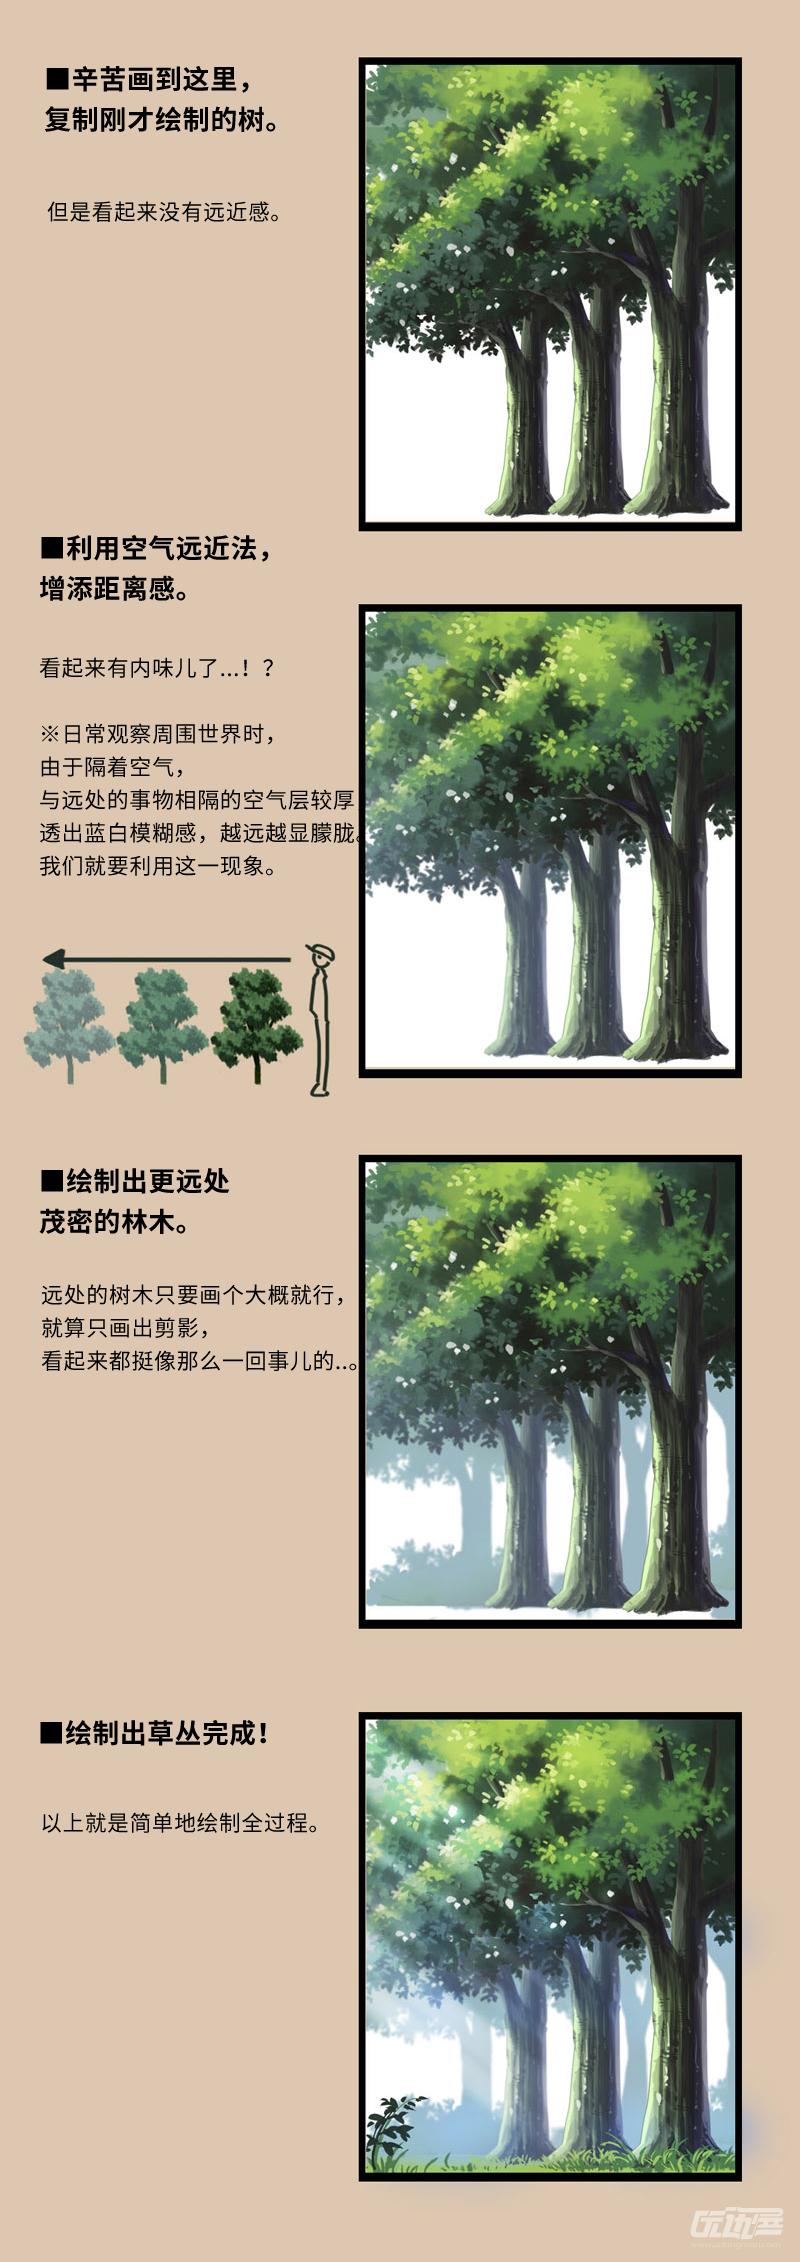 3-1_wps图片.png